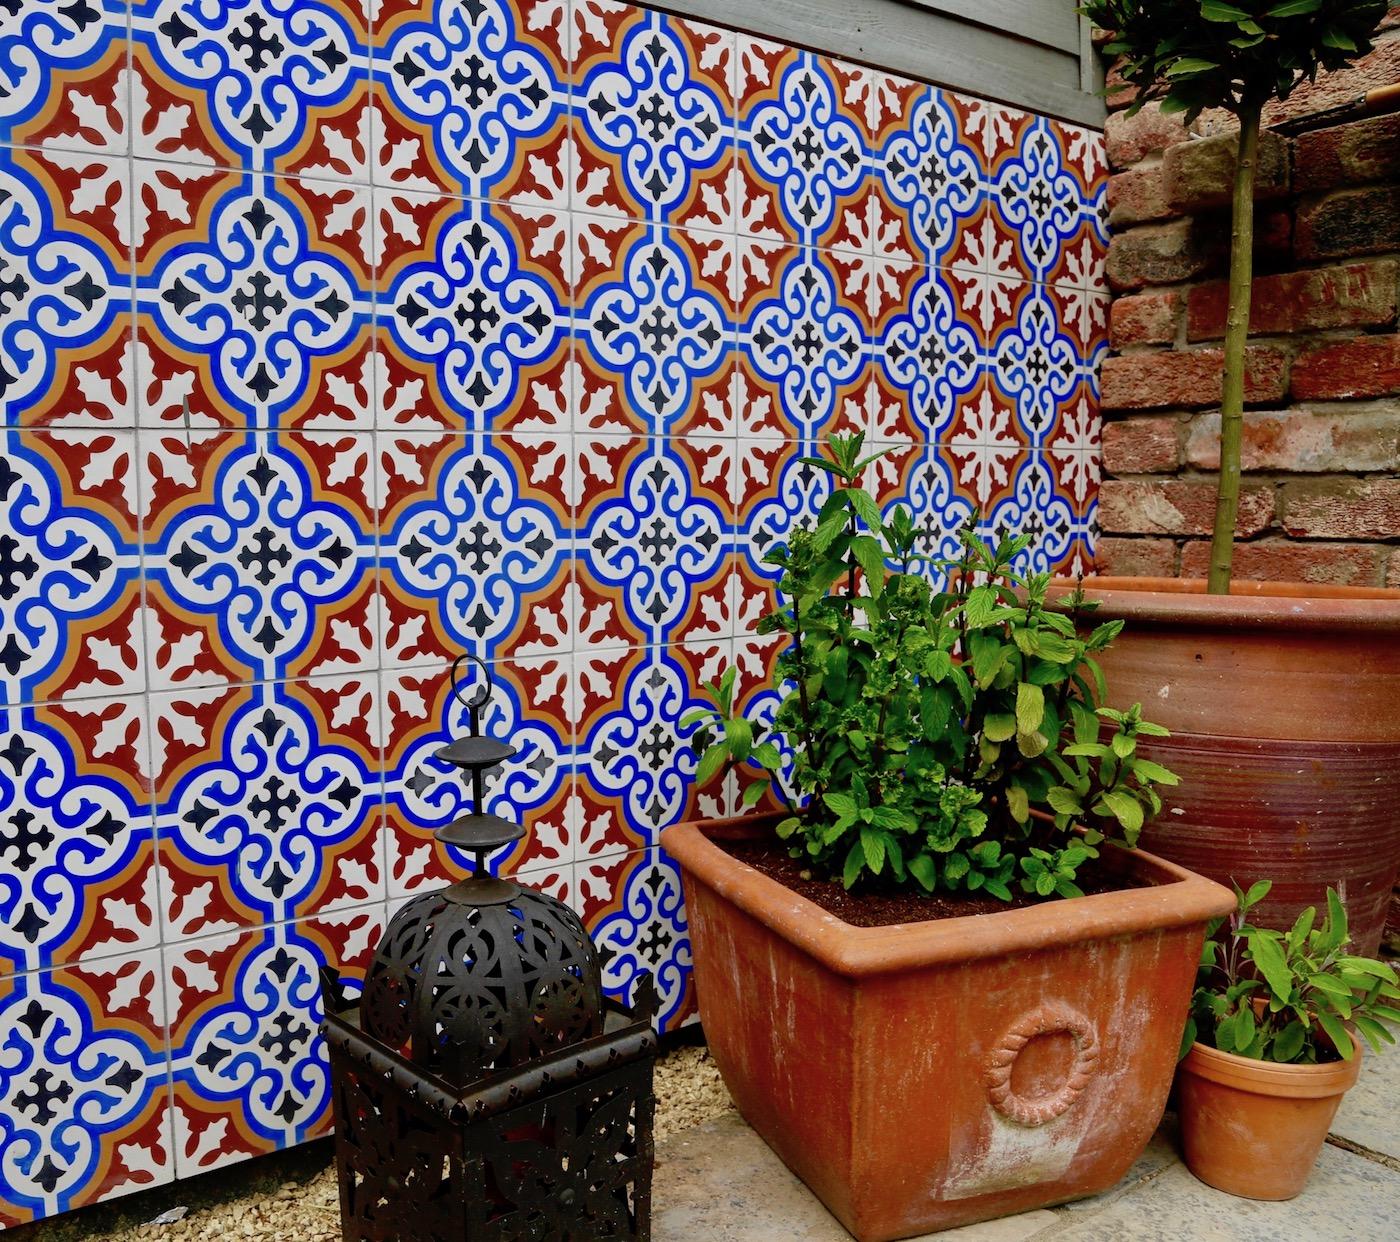 super-alex-alexandra-hollingsworth-garden-design-6.jpg